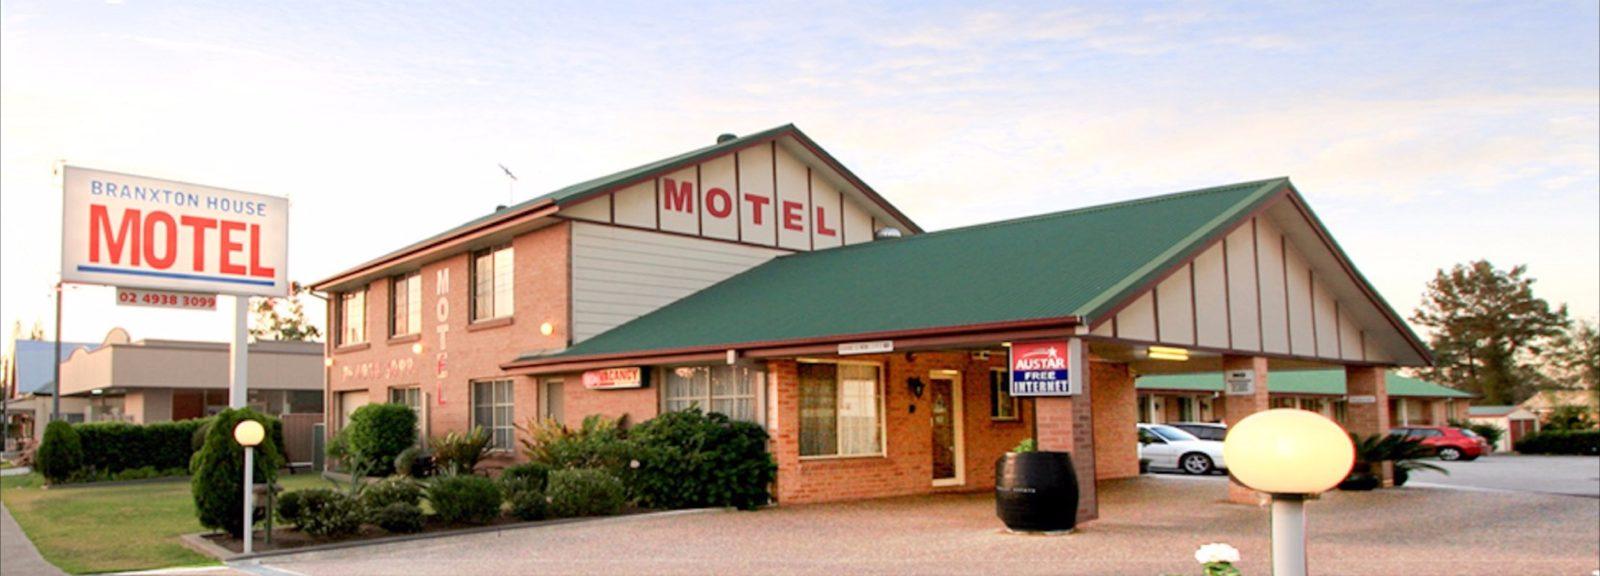 Branxton House Motel